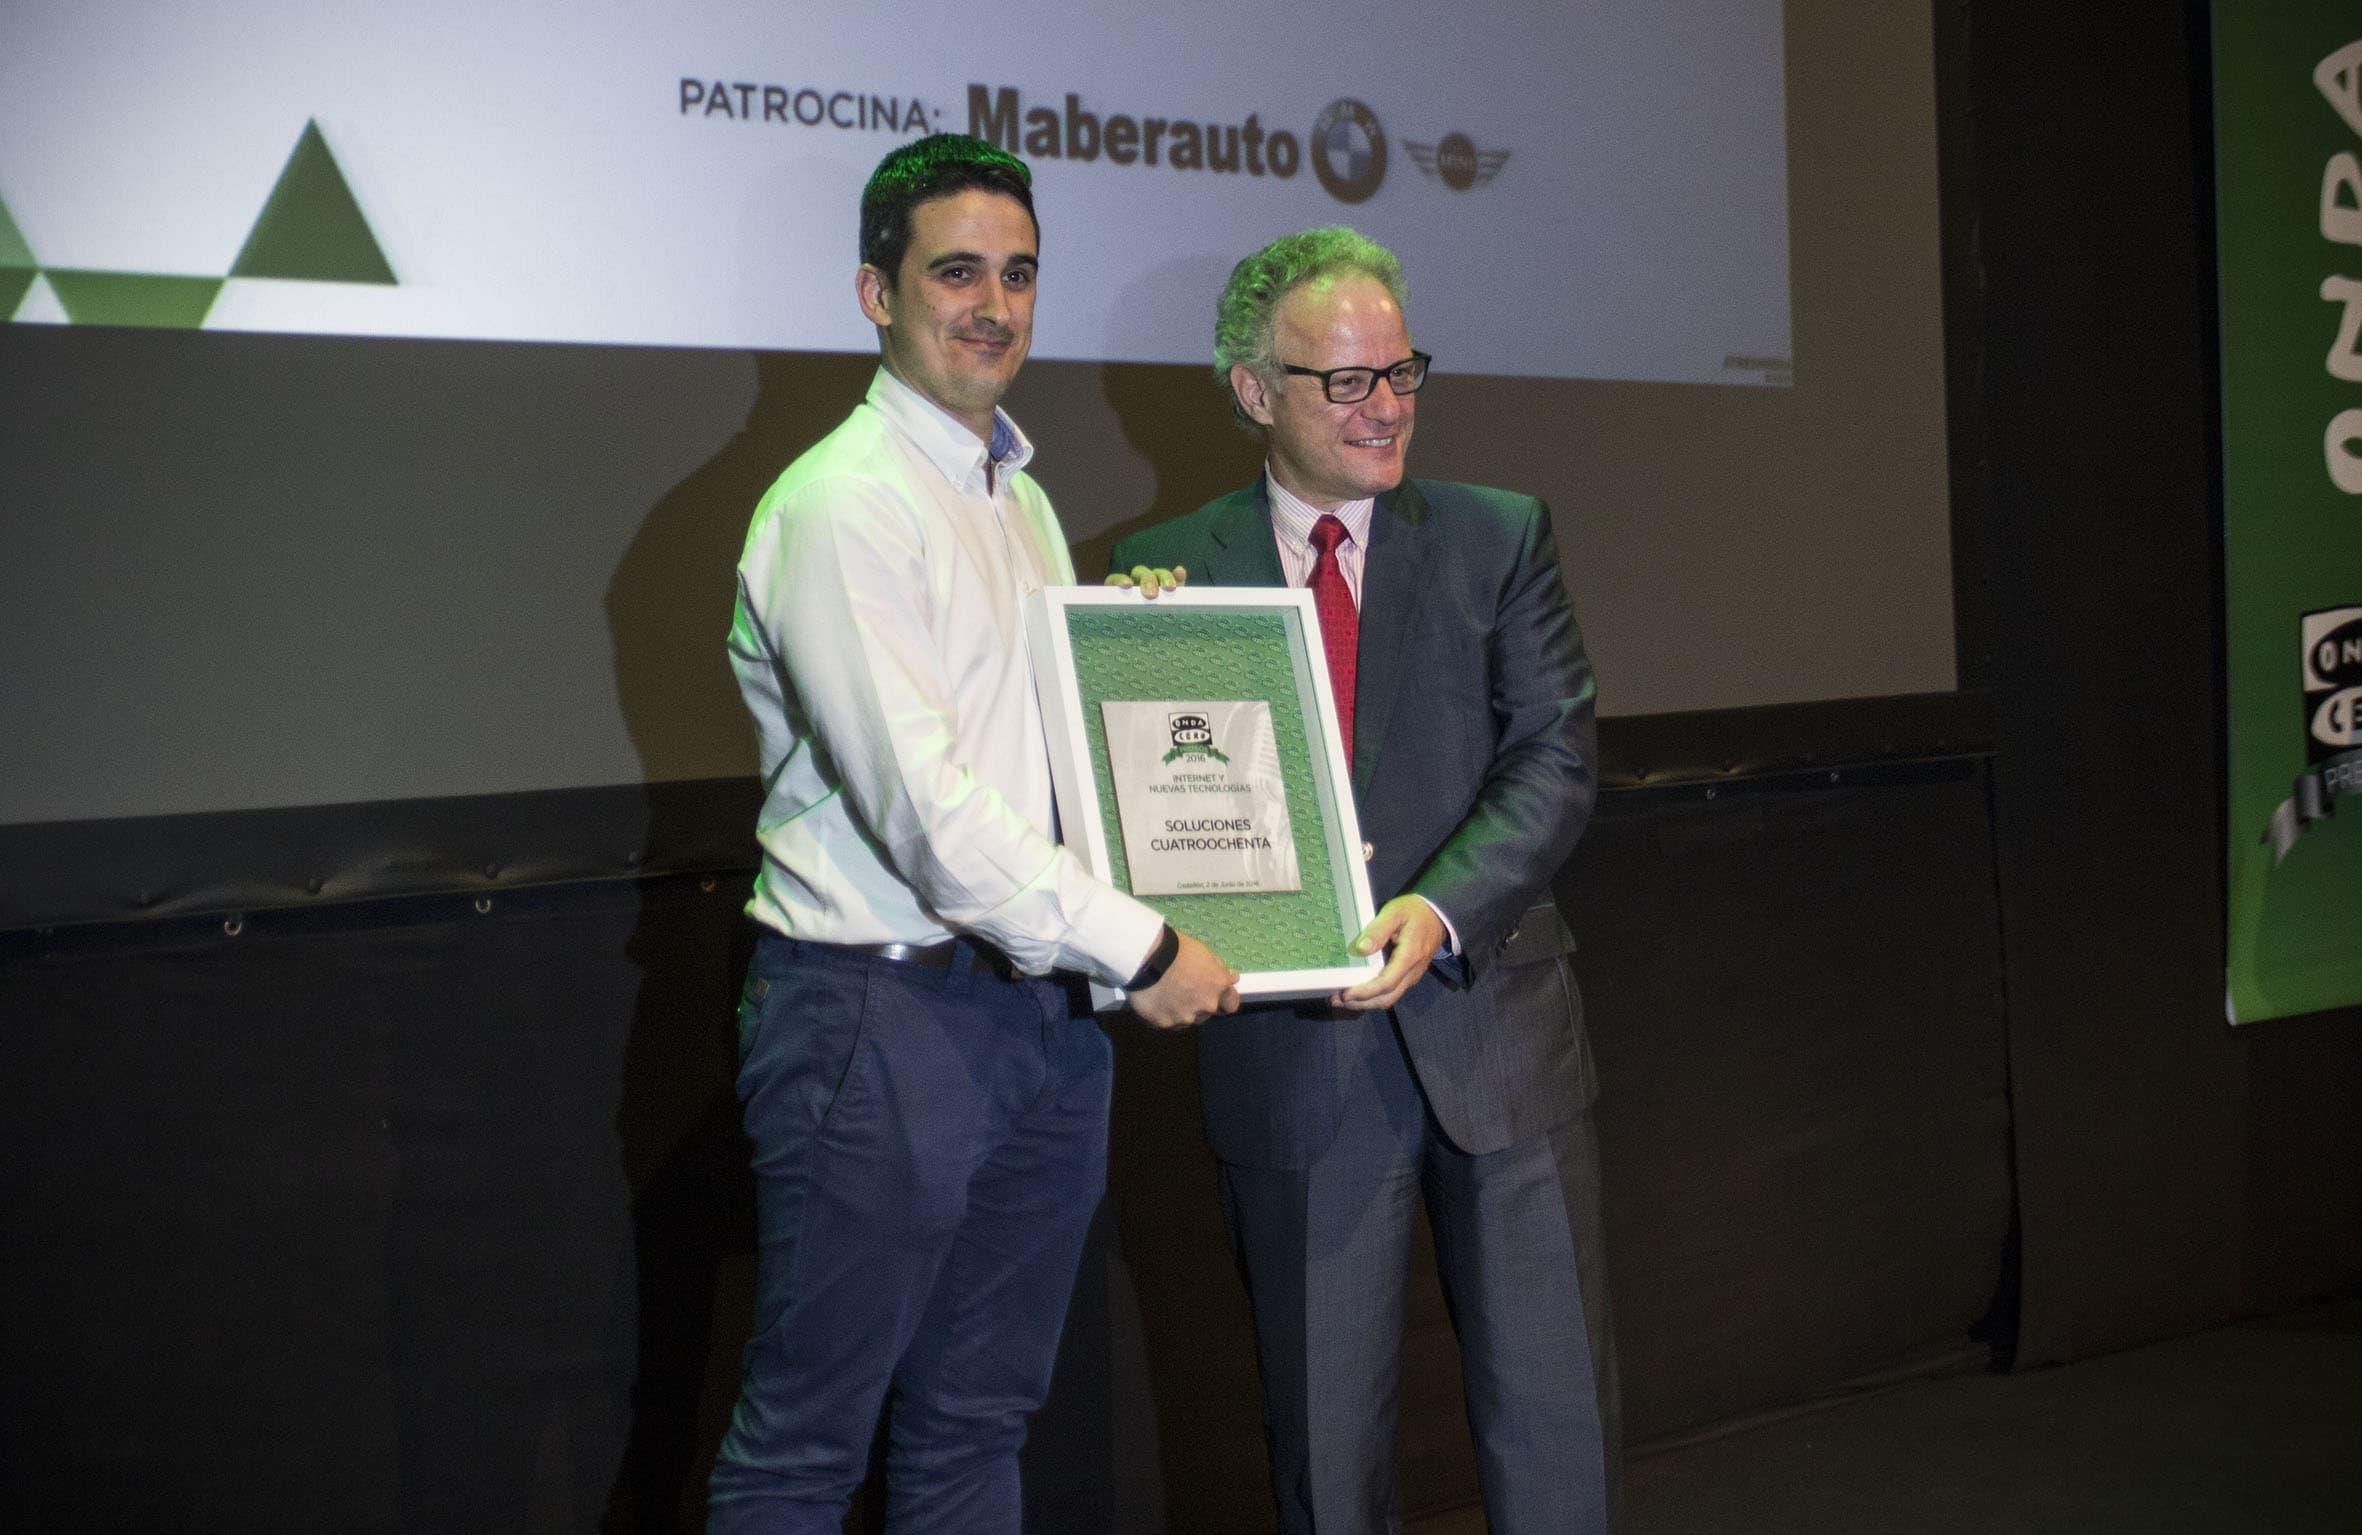 PremioOndaCeroCuatroochentaAlfredo